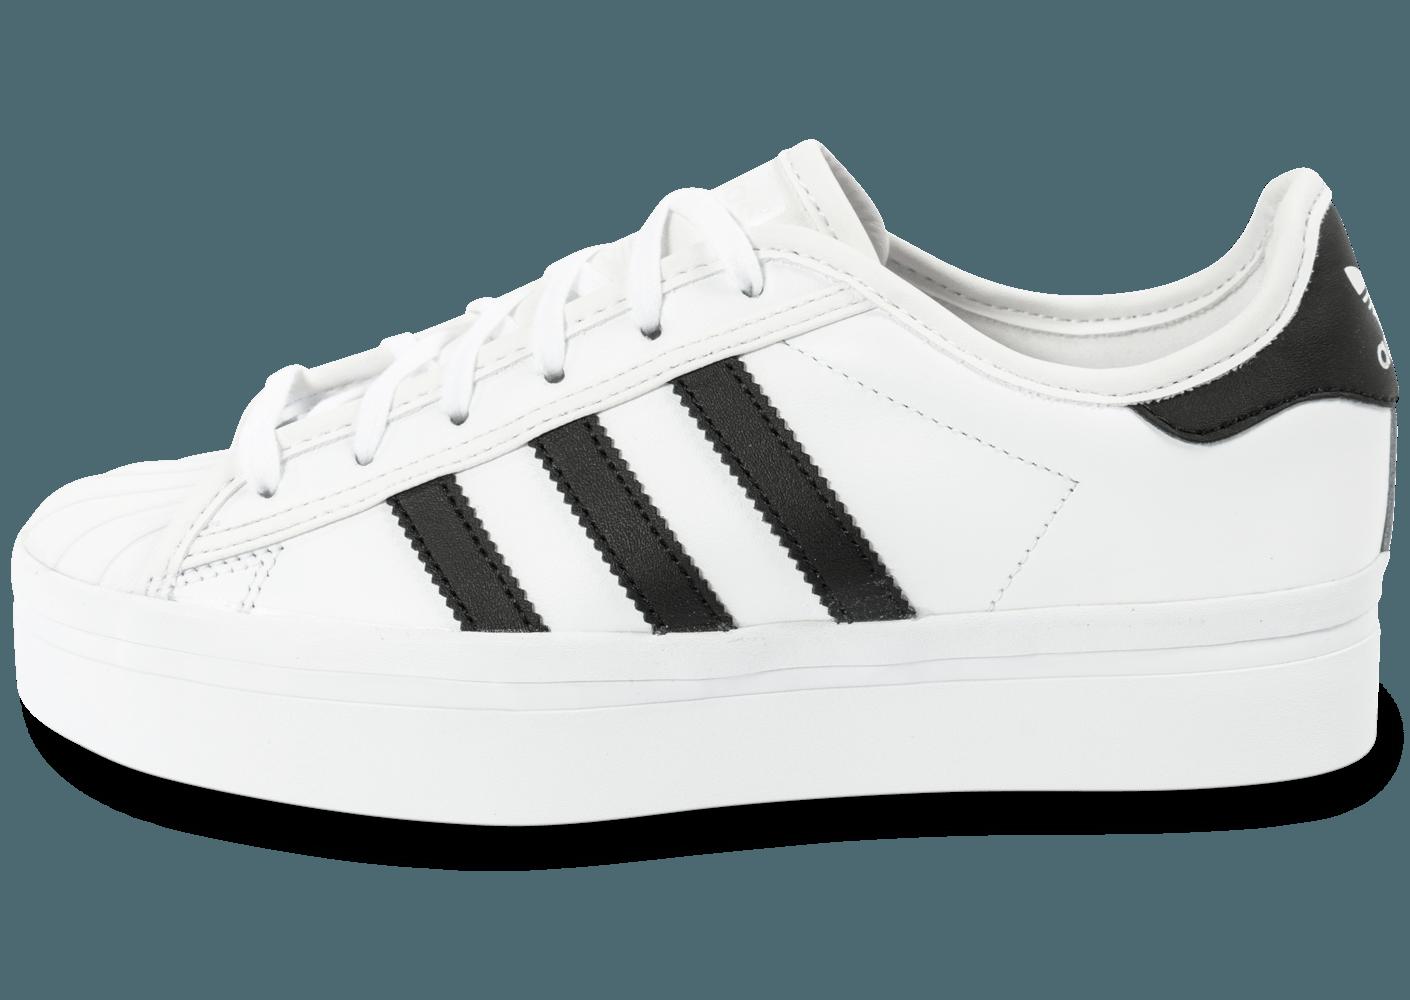 Adidas Superstar Blanche C35ajl4rq Plateforme Rize